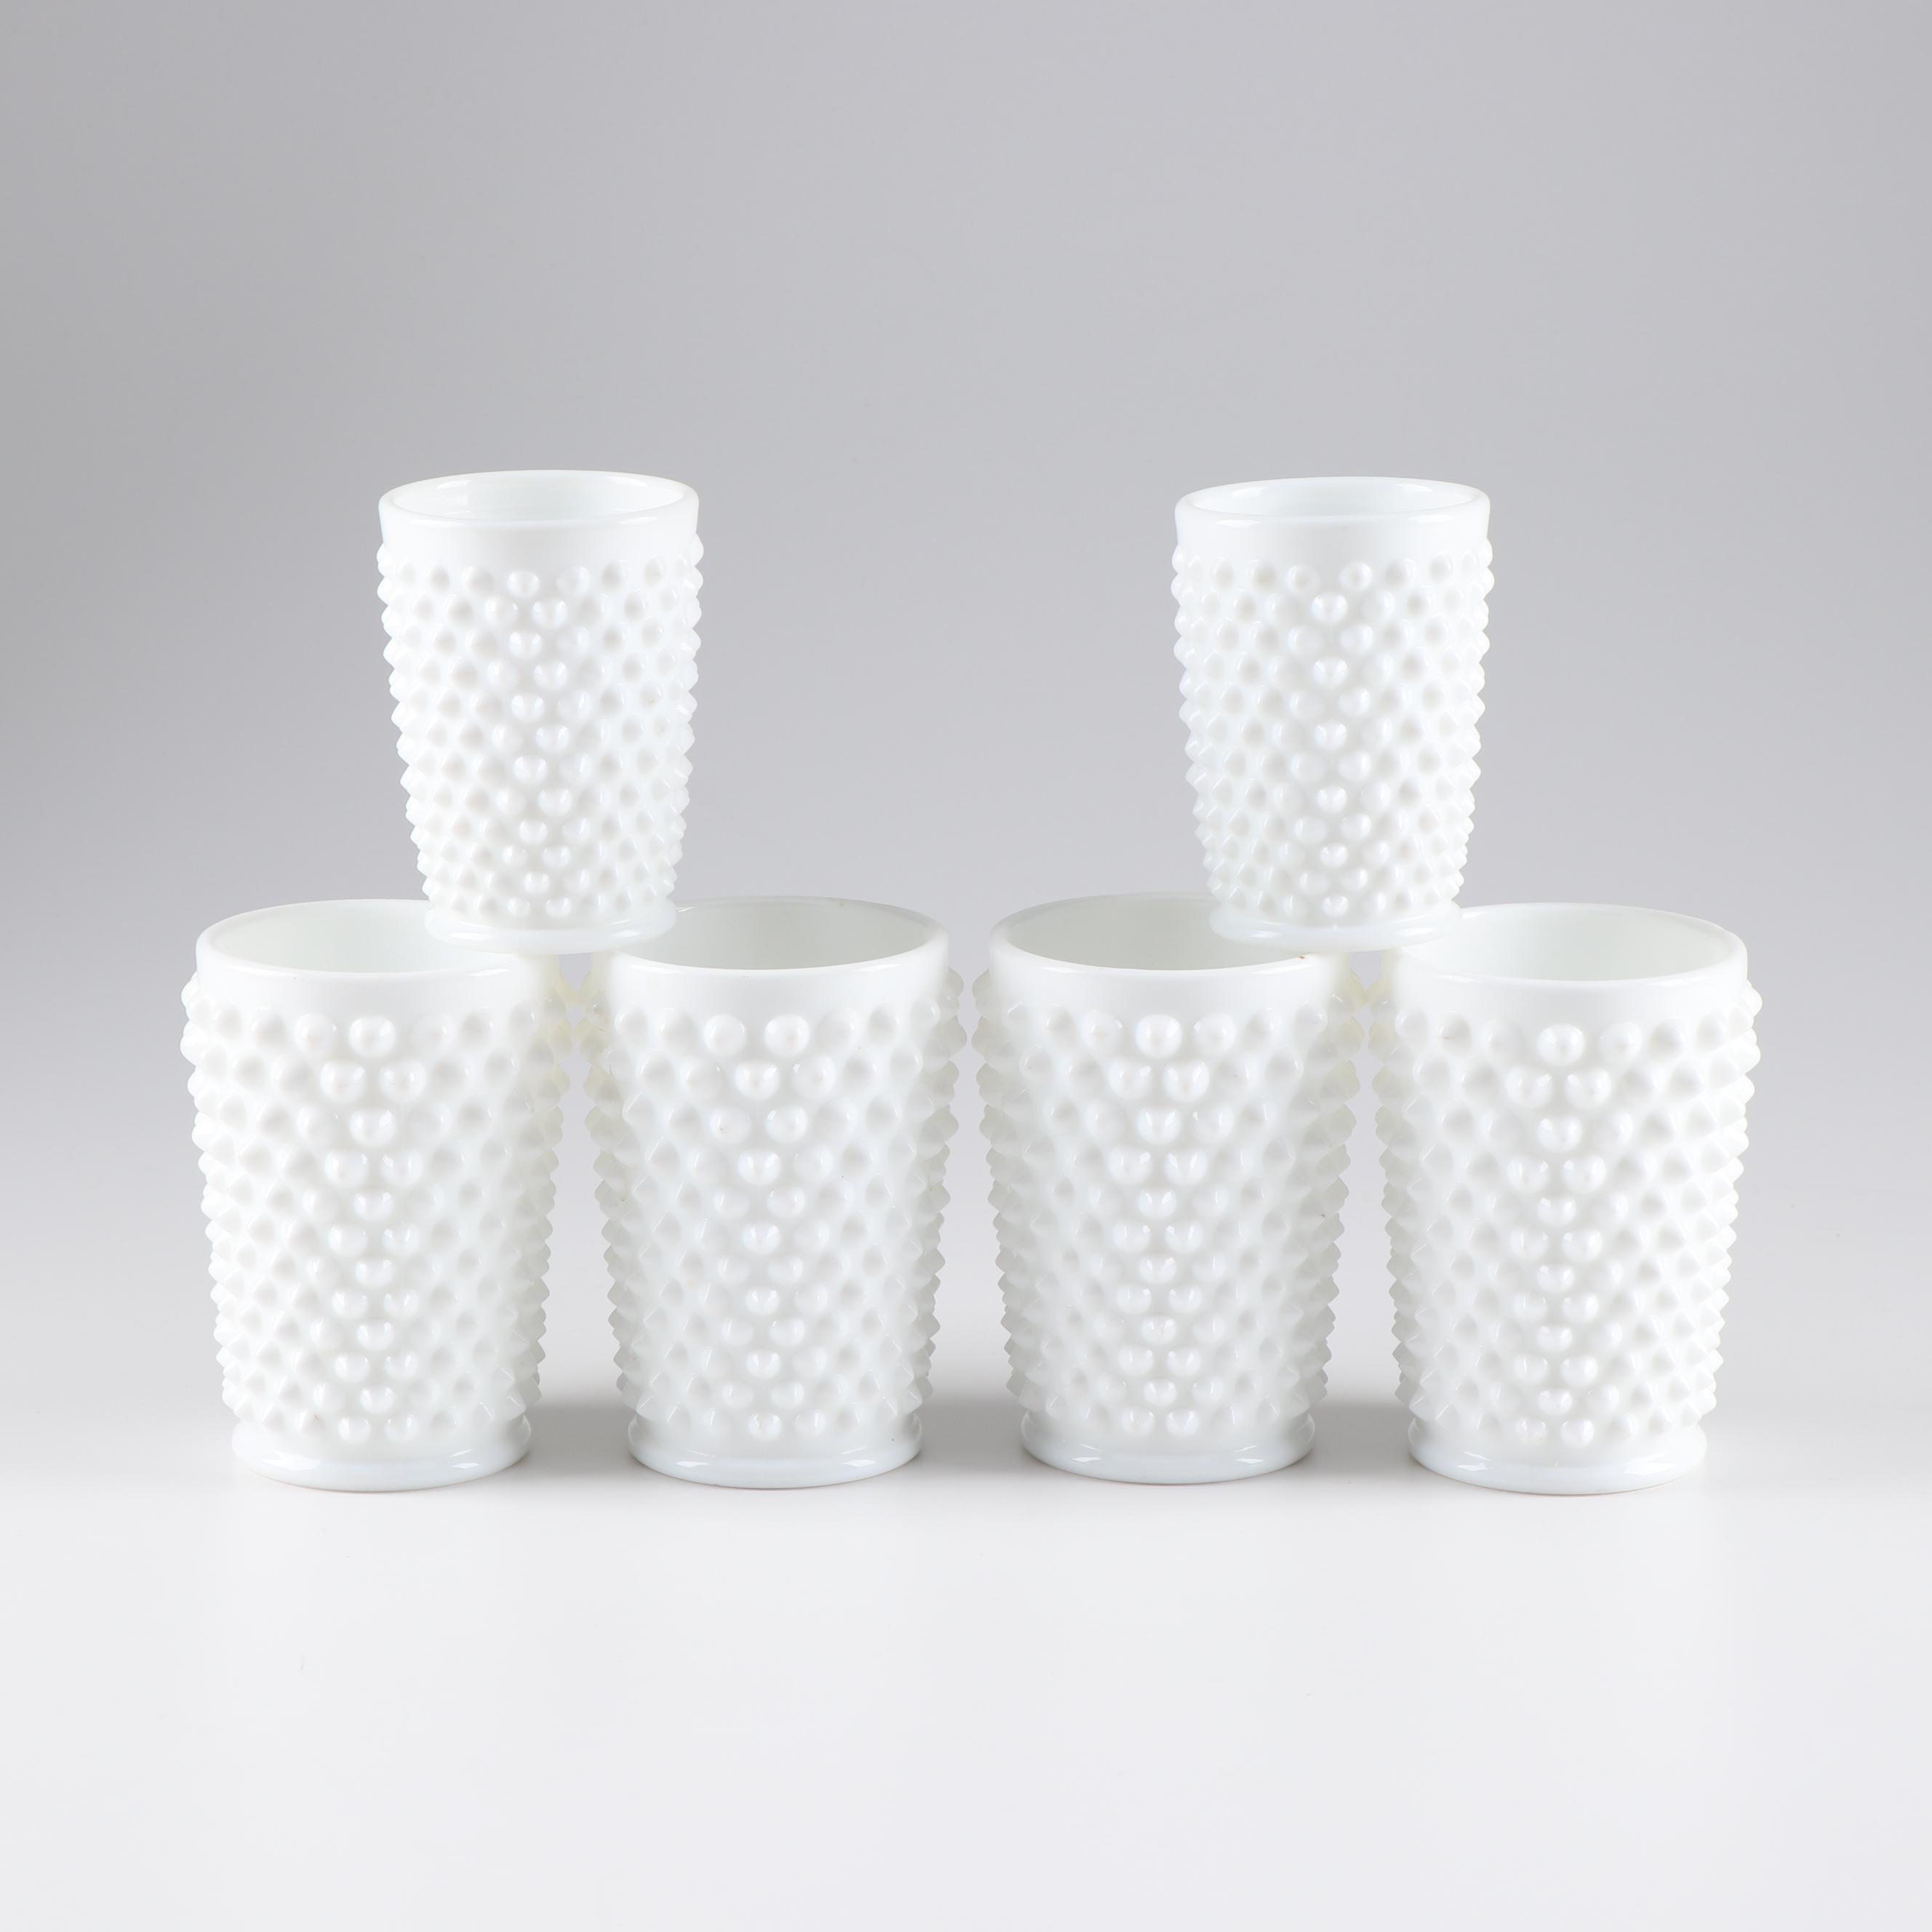 Fenton Hobnail Milk Glass Tumblers and Juice Glasses